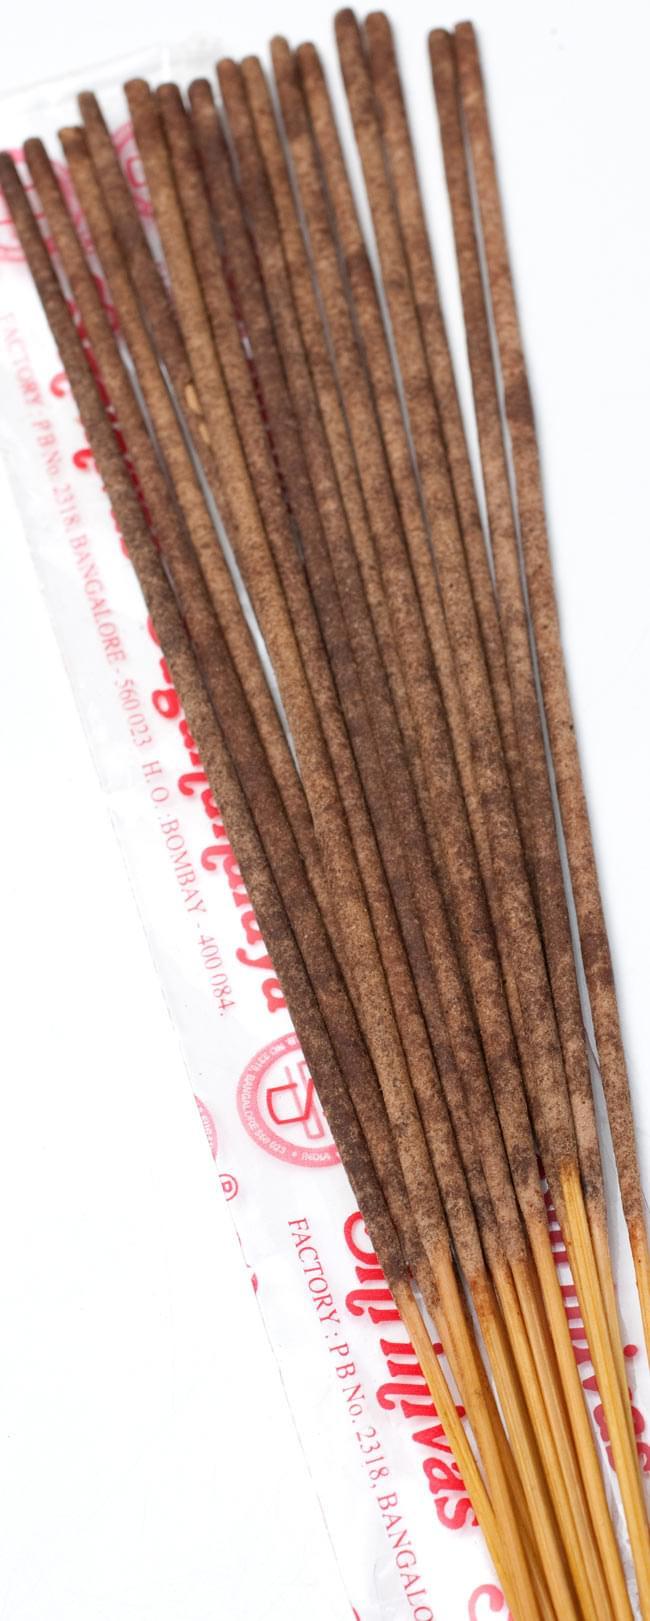 【Satya】ジャスミン香 Jasmine Blossom Incenseの写真4 - お香の写真です